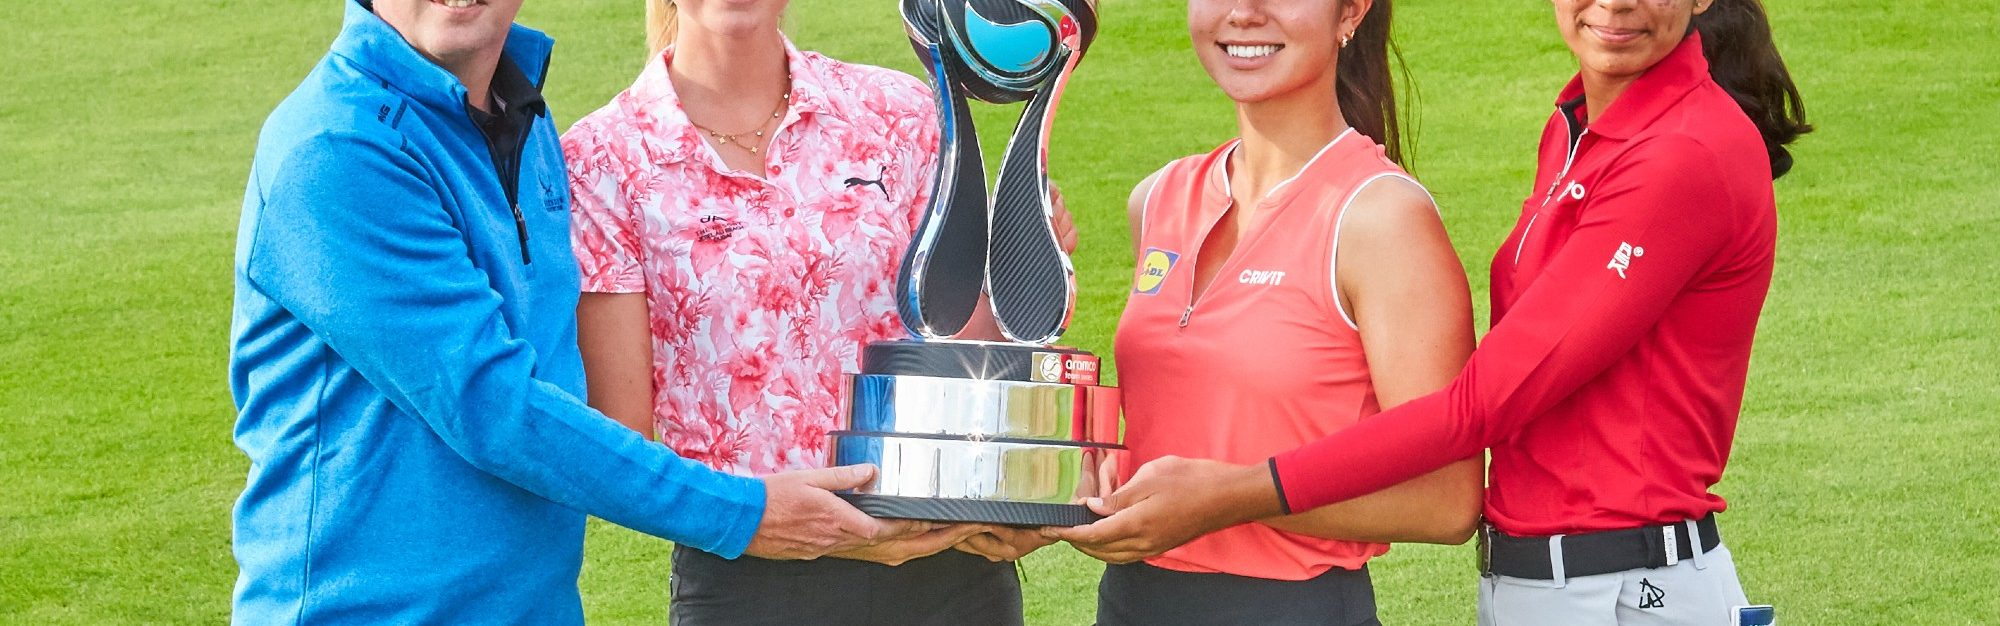 Team Cowan and Skarpnord take the honours at inaugural Aramco Team Series